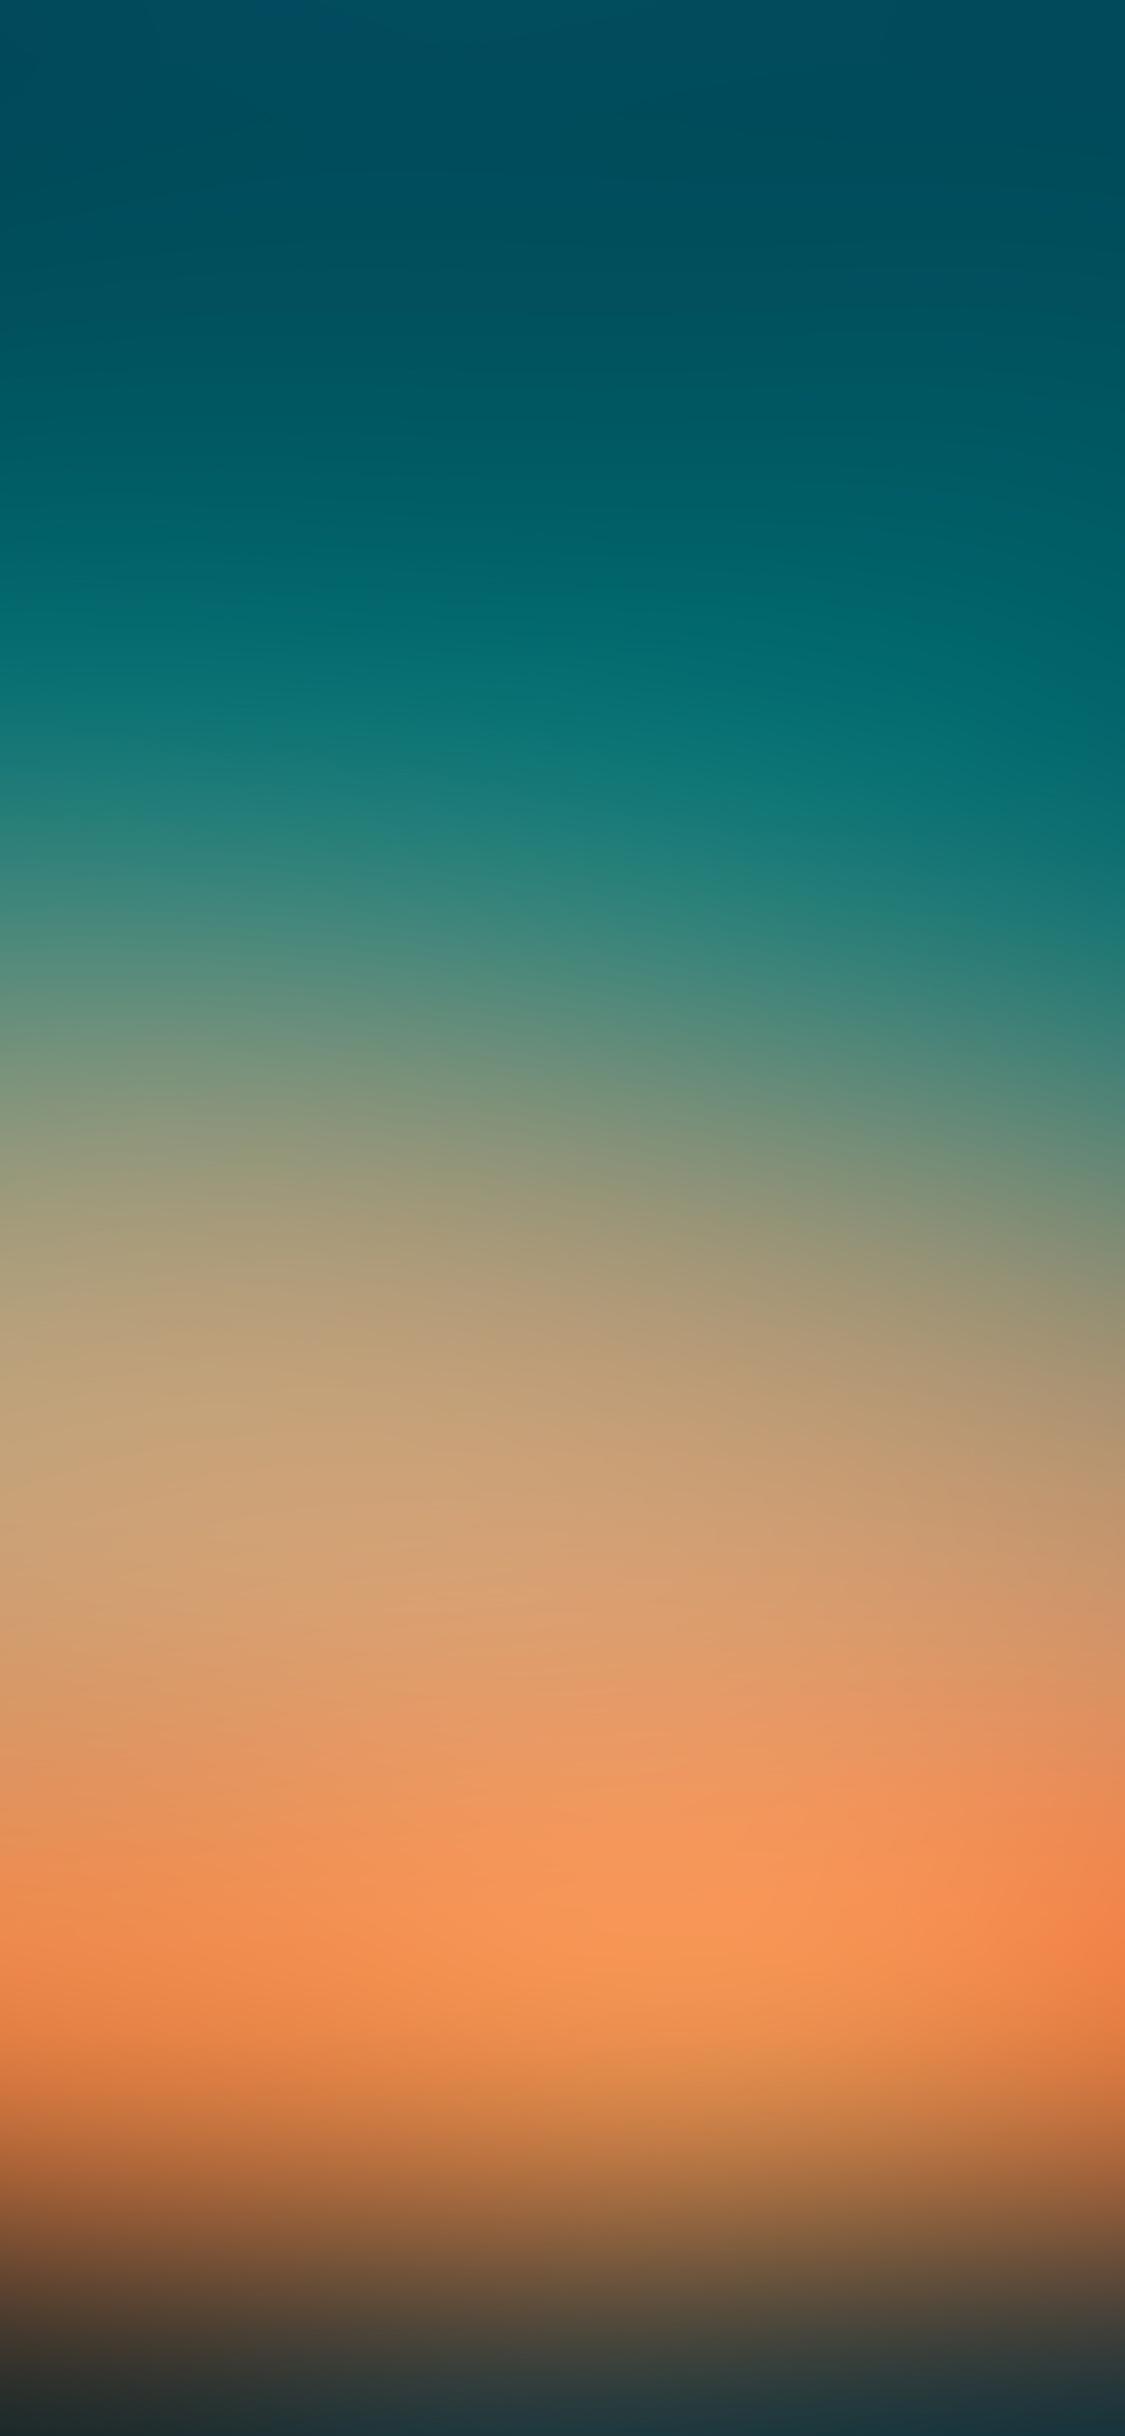 iPhoneXpapers.com-Apple-iPhone-wallpaper-si30-sunset-night-orange-green-gradation-blur